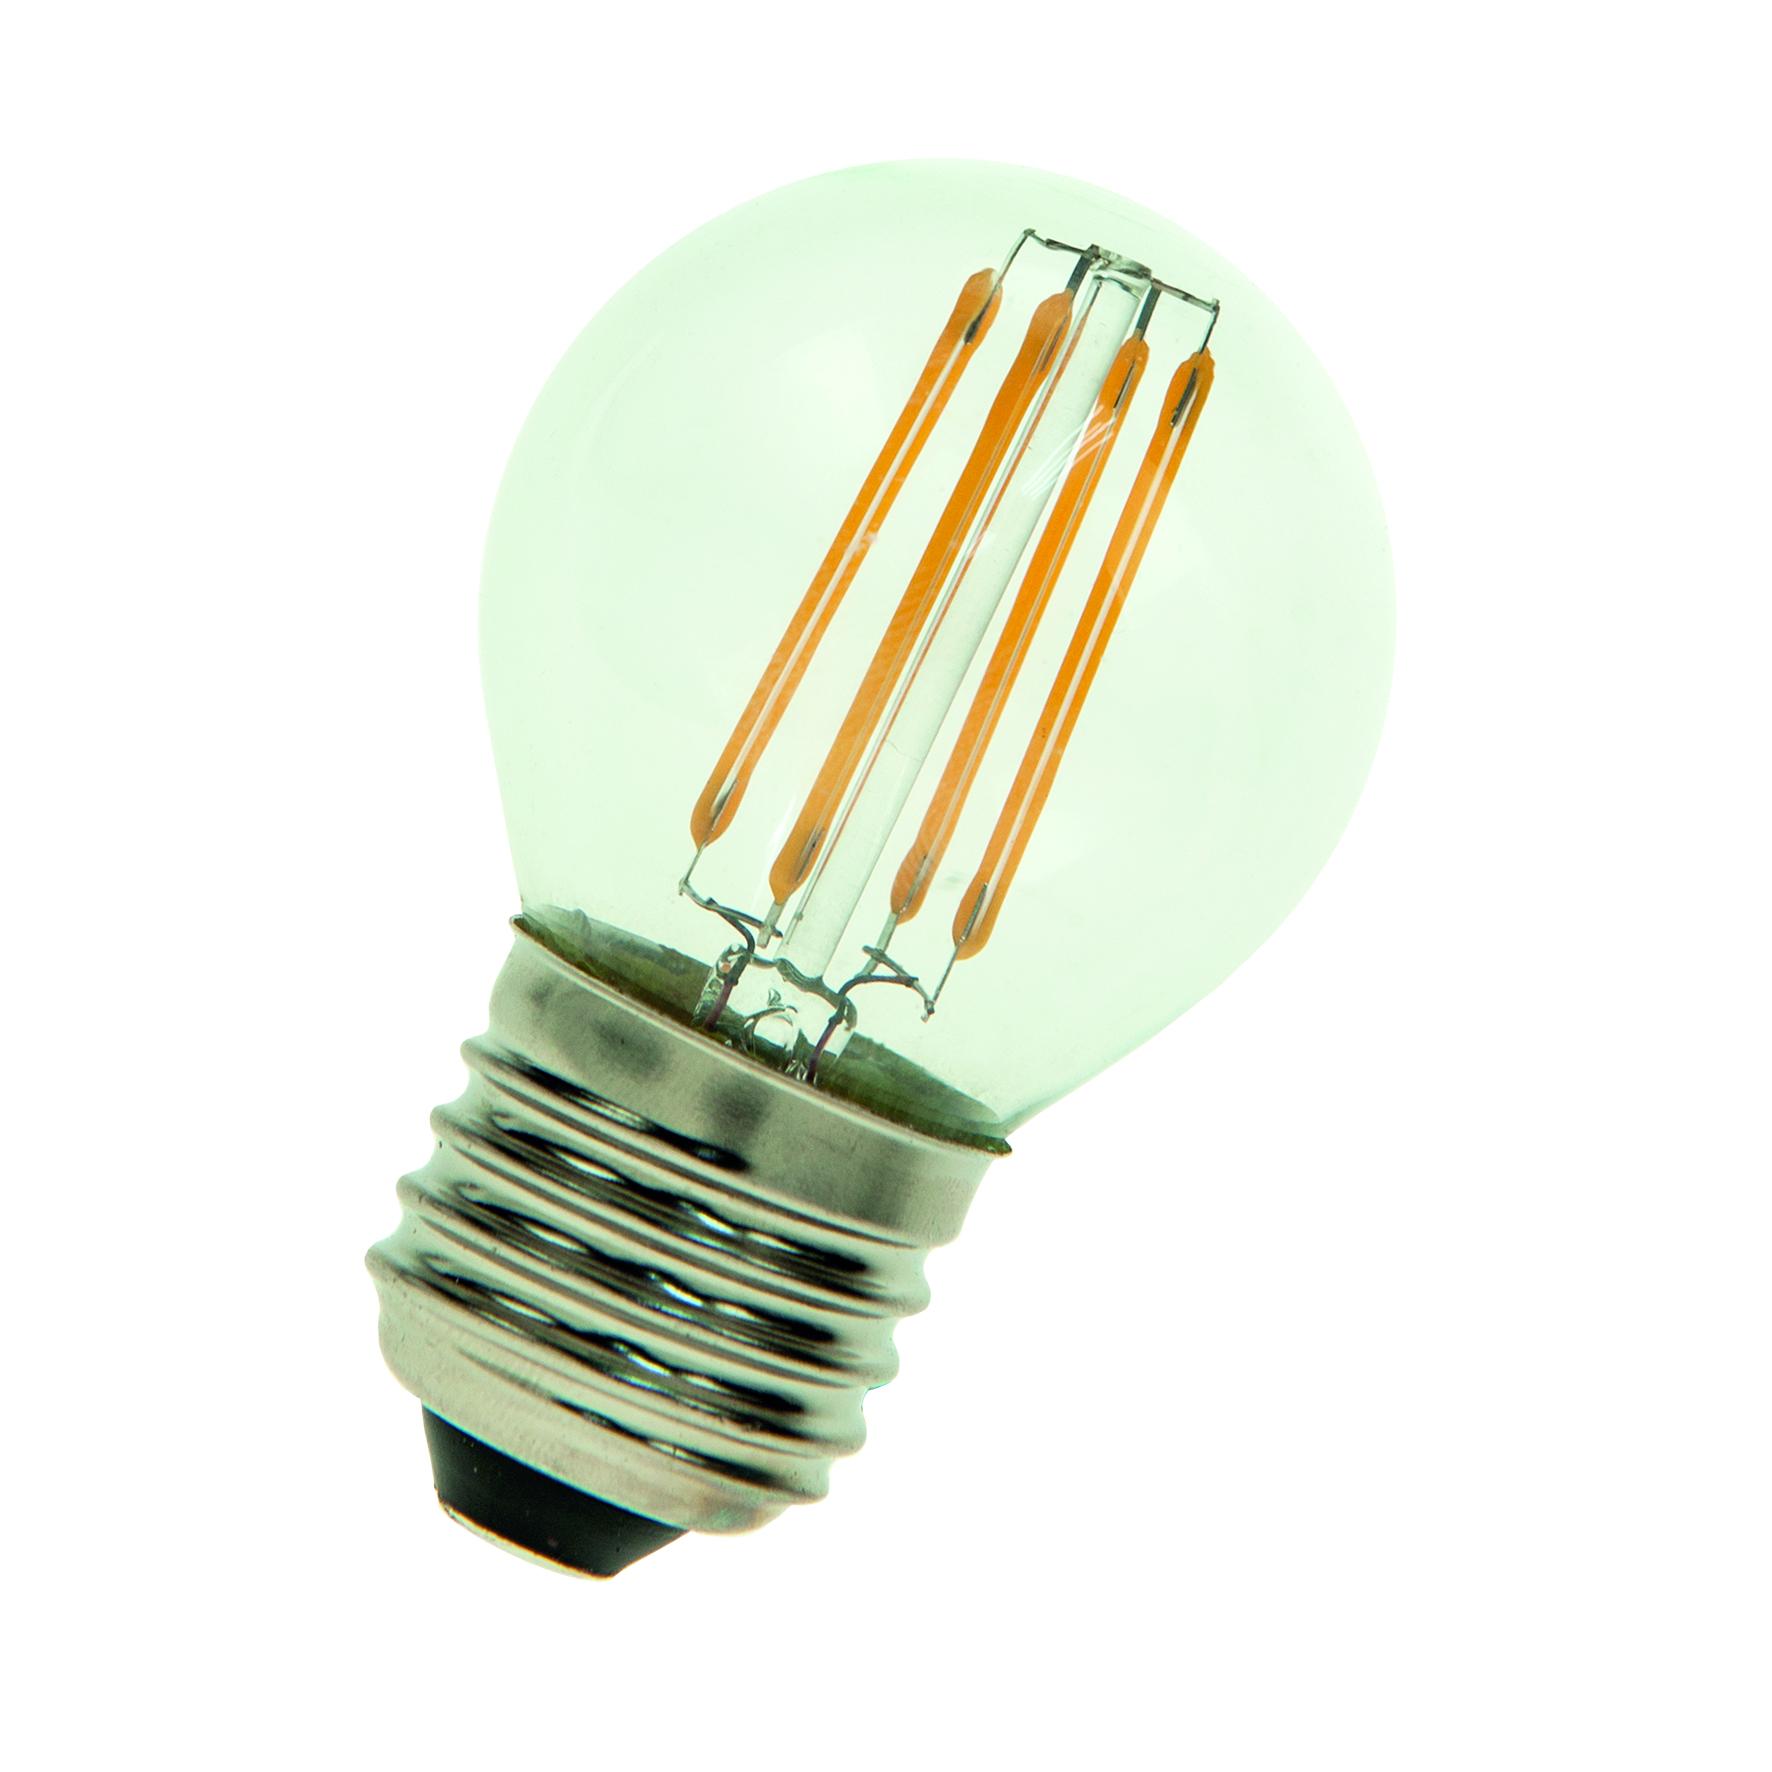 Bailey 80100037256 | LED Filament G45 E27 24V/DC 3W 2700K Clear ...